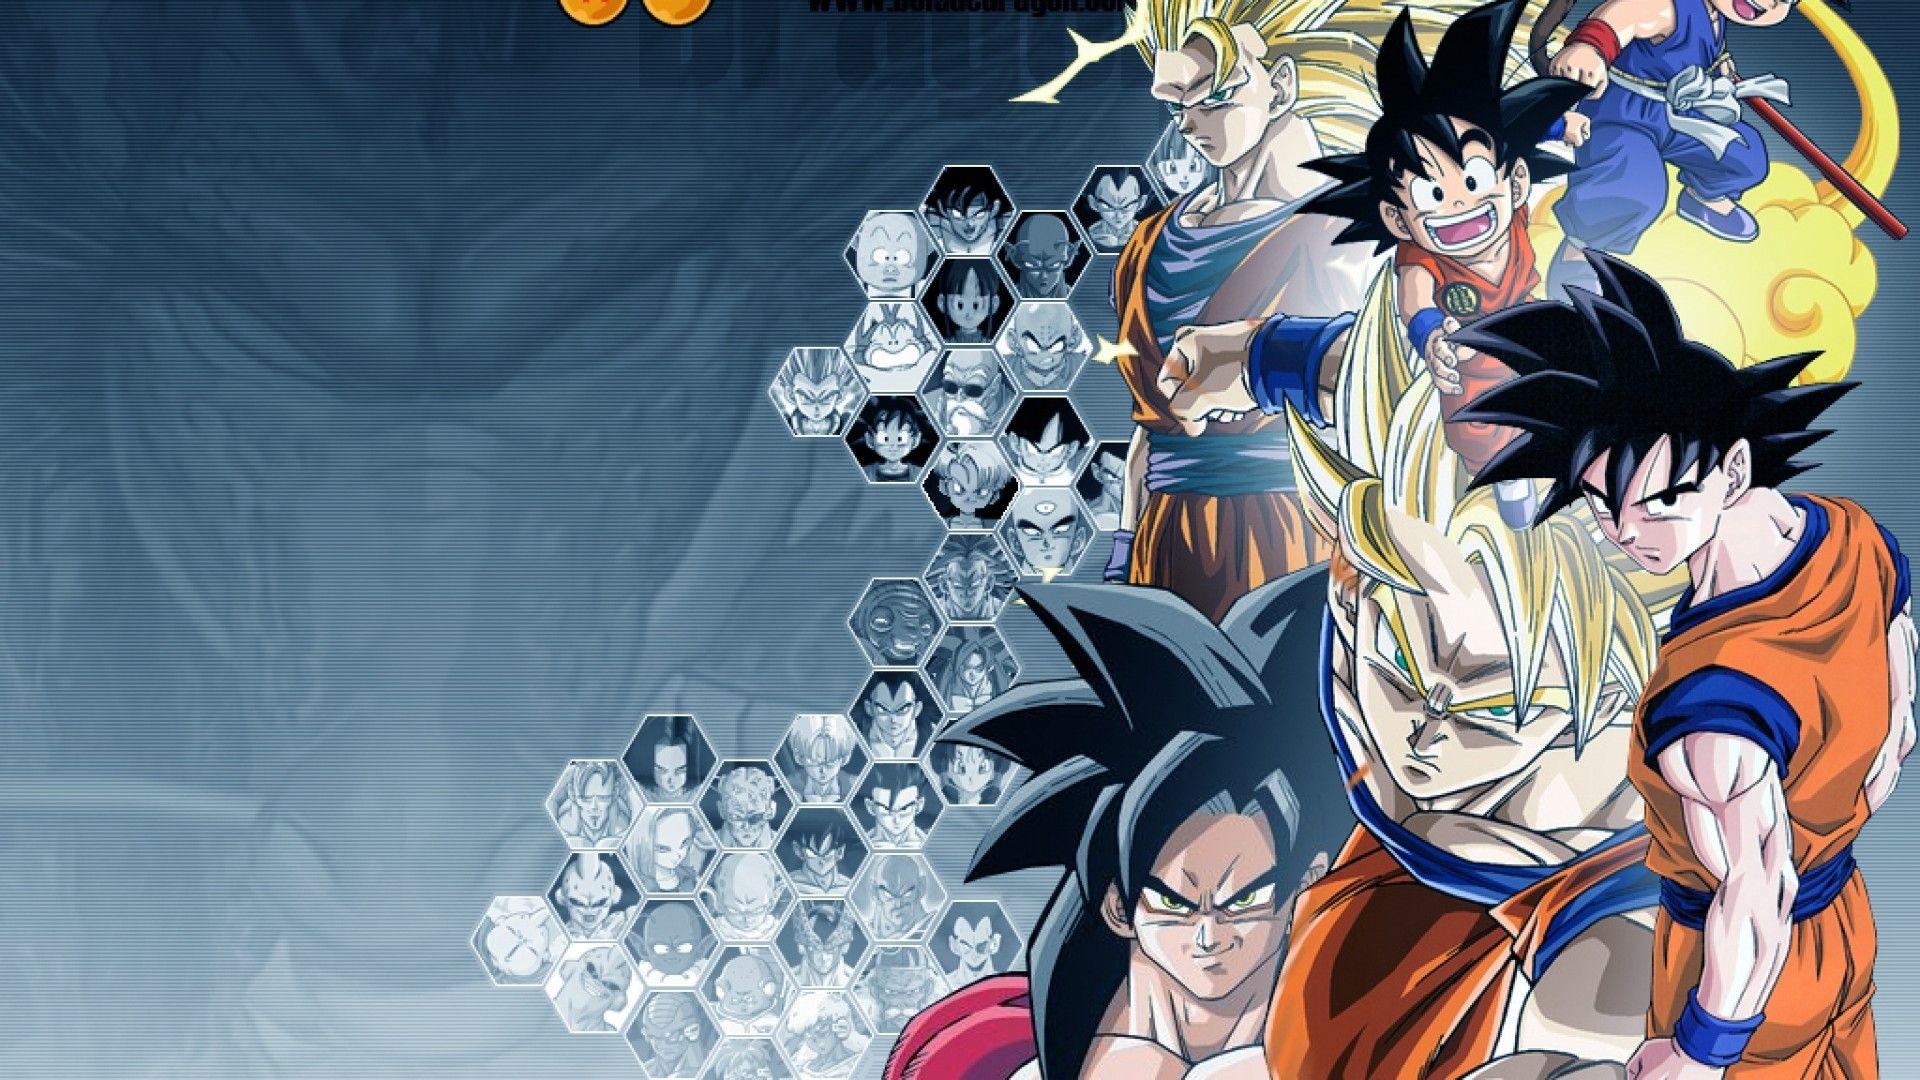 Goku Wallpaper Hd For Pc 20 Jpg 1920 1080 Goku Wallpaper Dragon Ball Wallpapers Dragon Ball Z